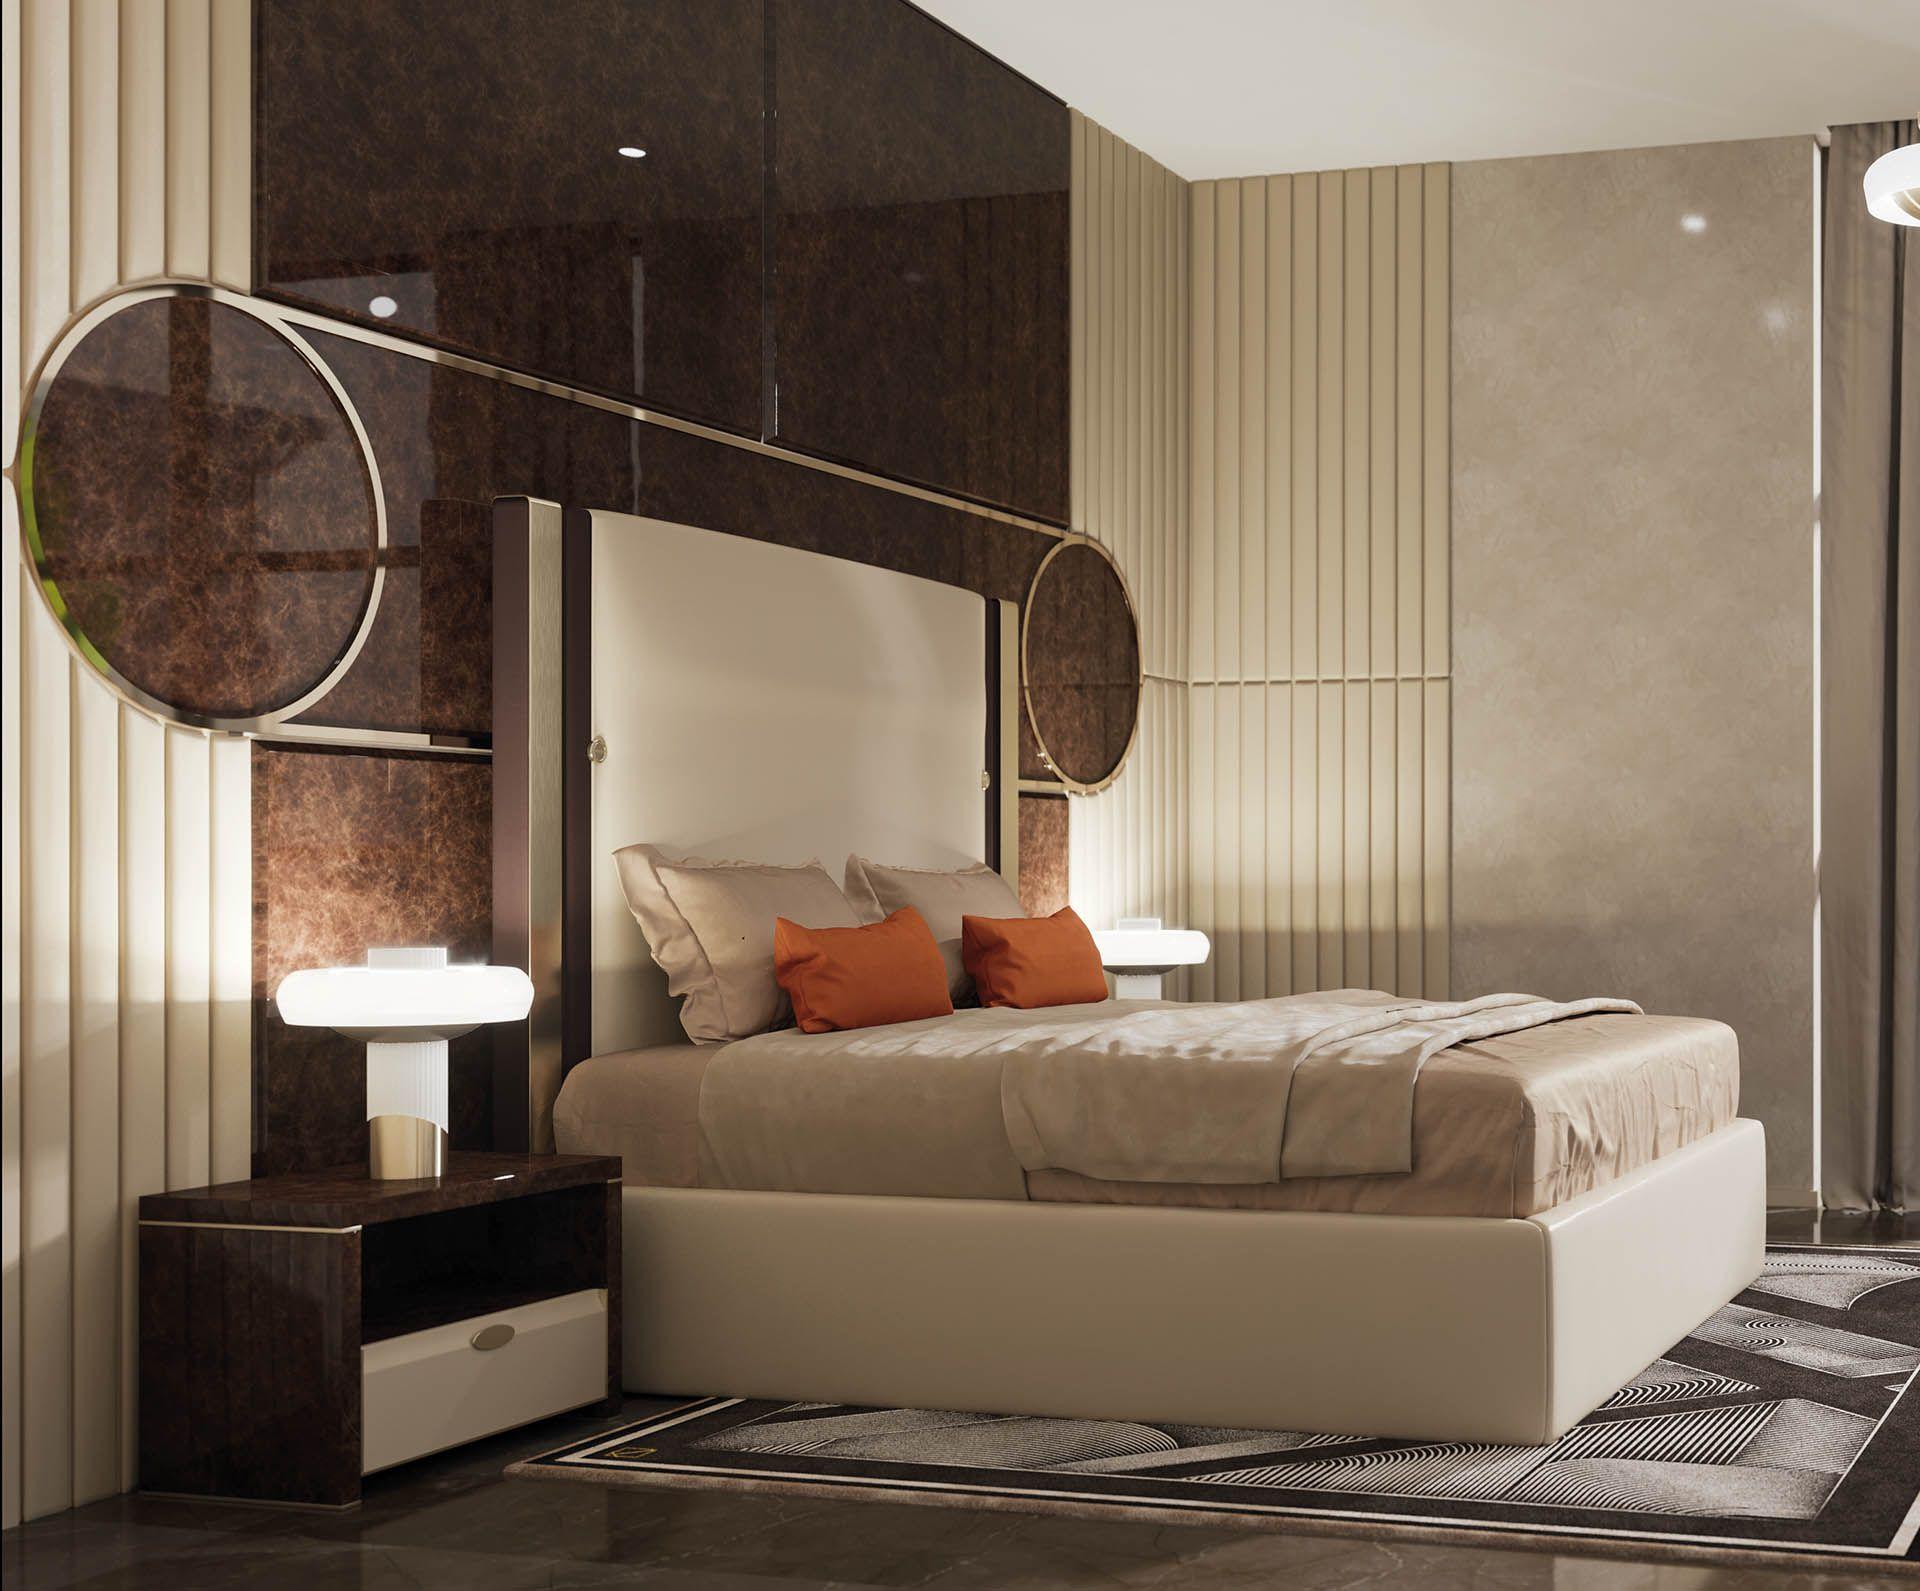 Plaza Bed Italian luxury bedroom Italian furniture